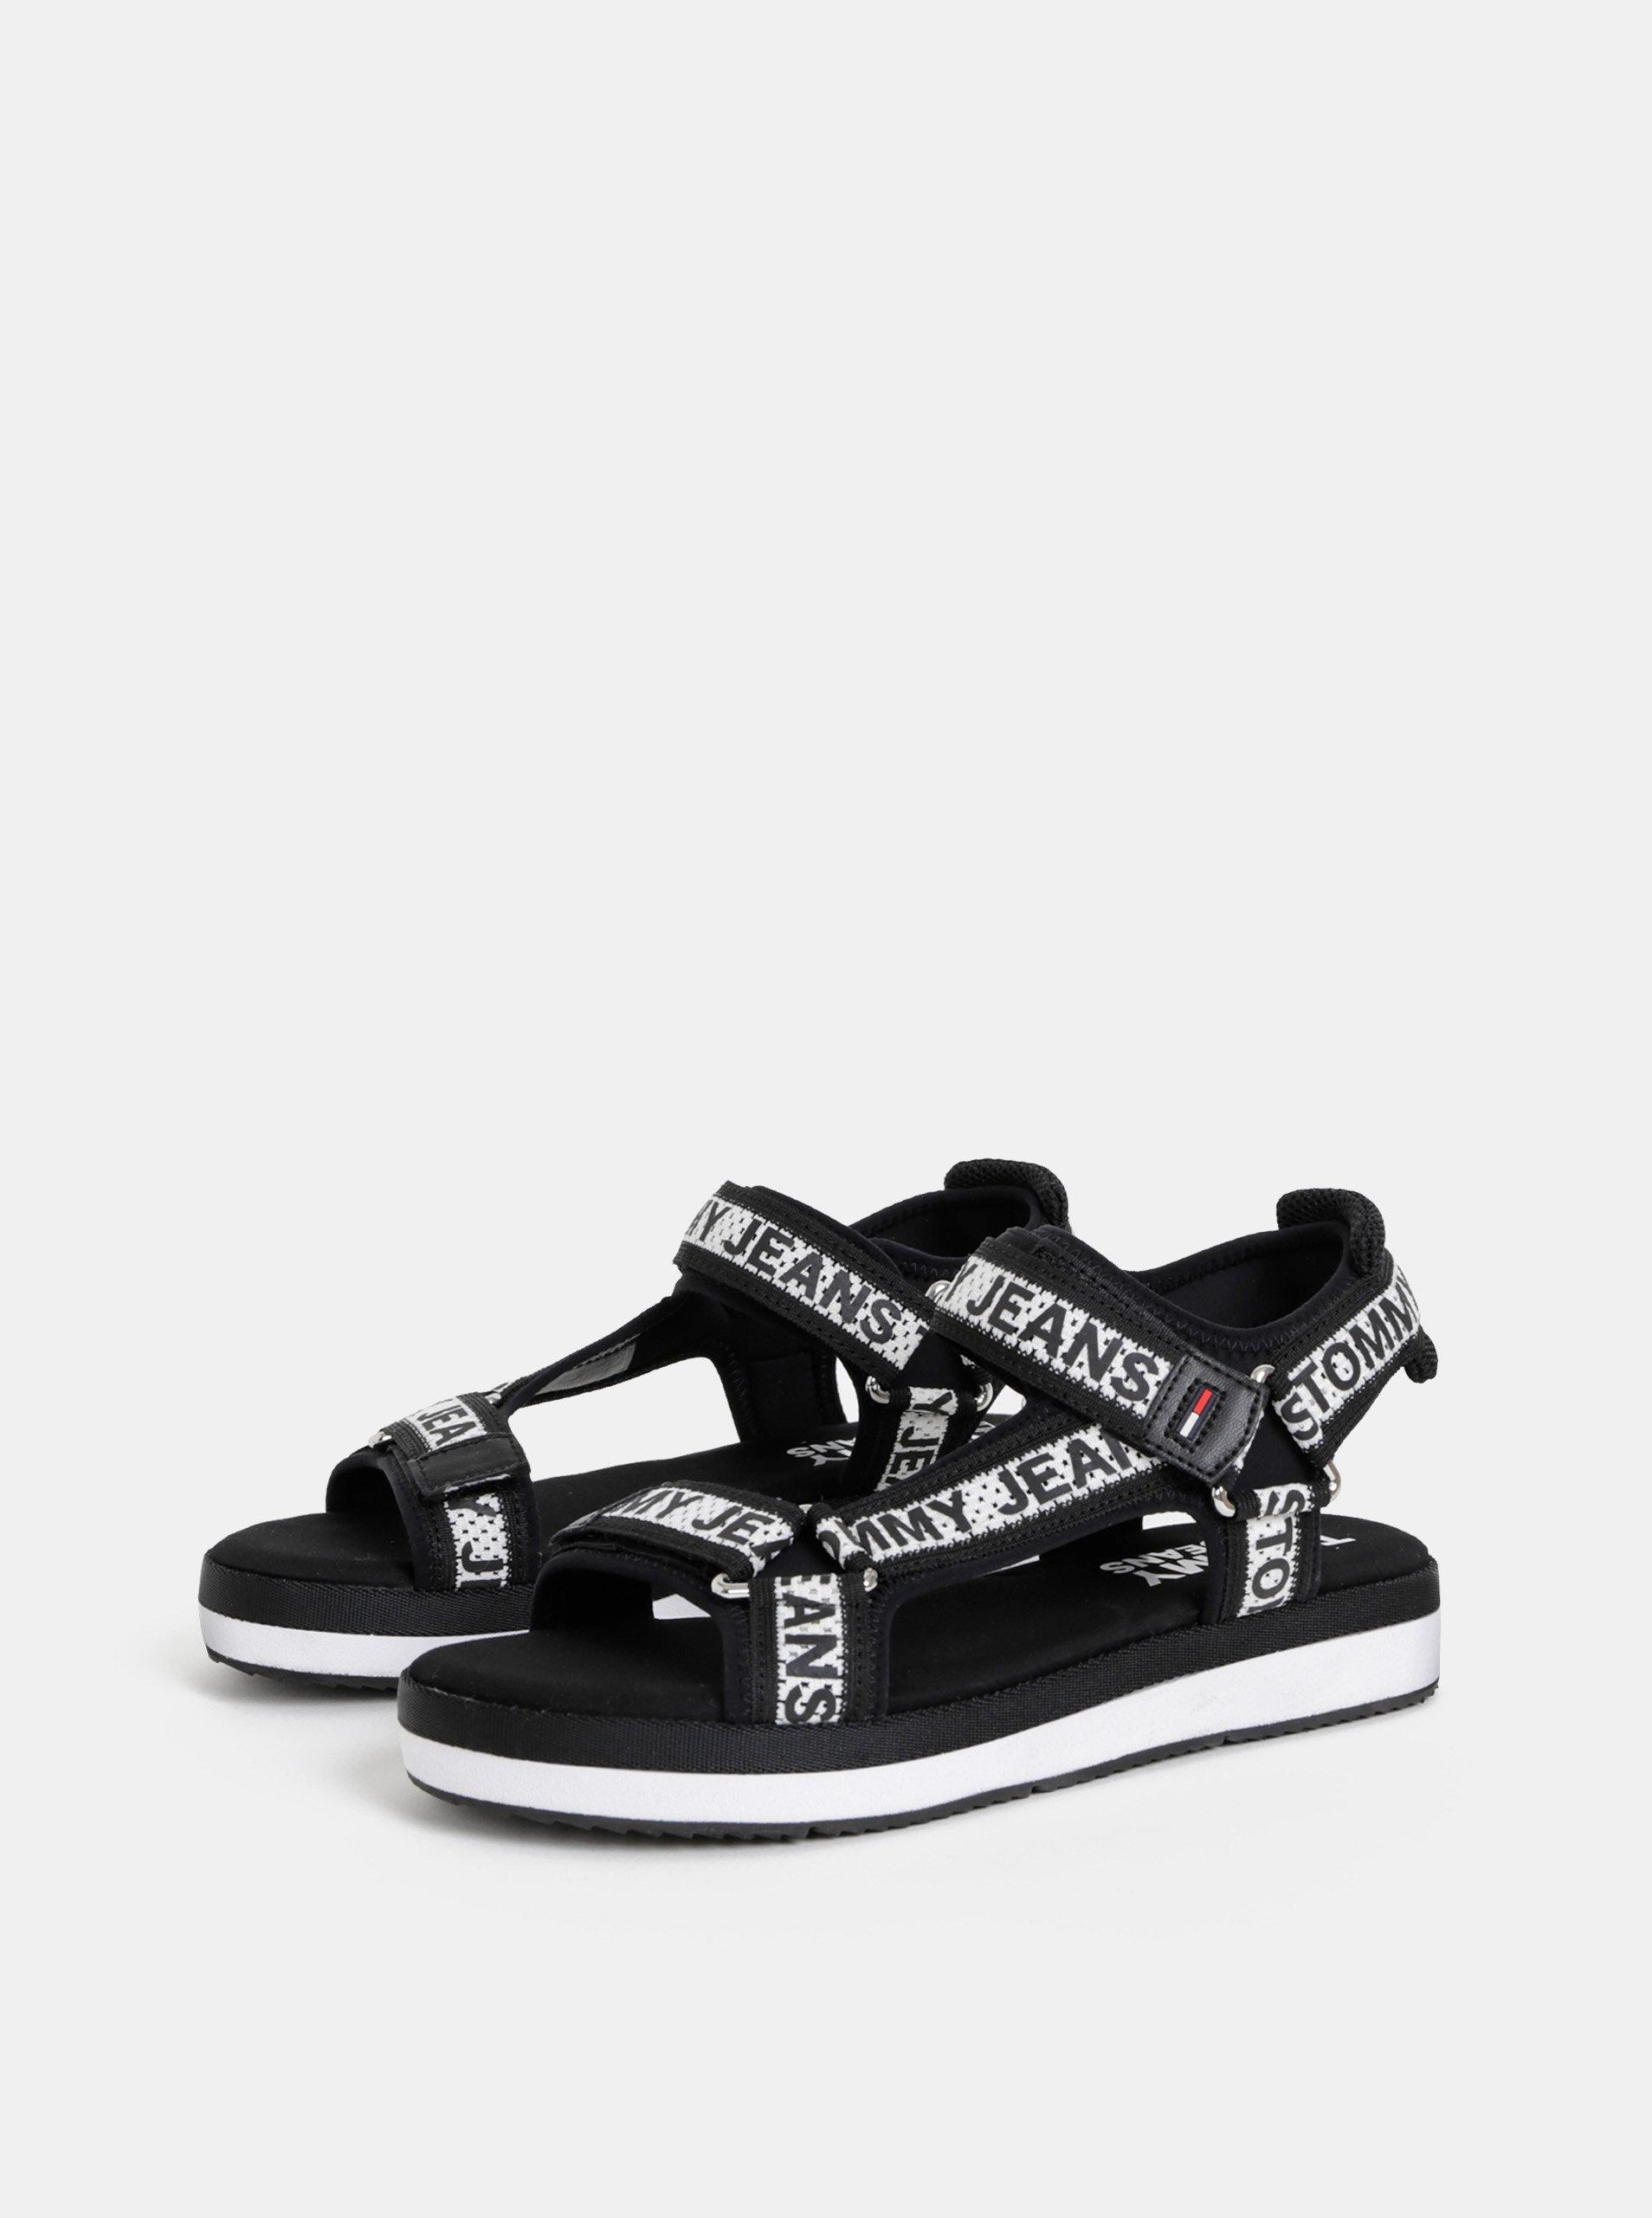 3e46491ff2c2e Čierne dámske vzorované sandále Tommy Hilfiger   ZOOT.sk